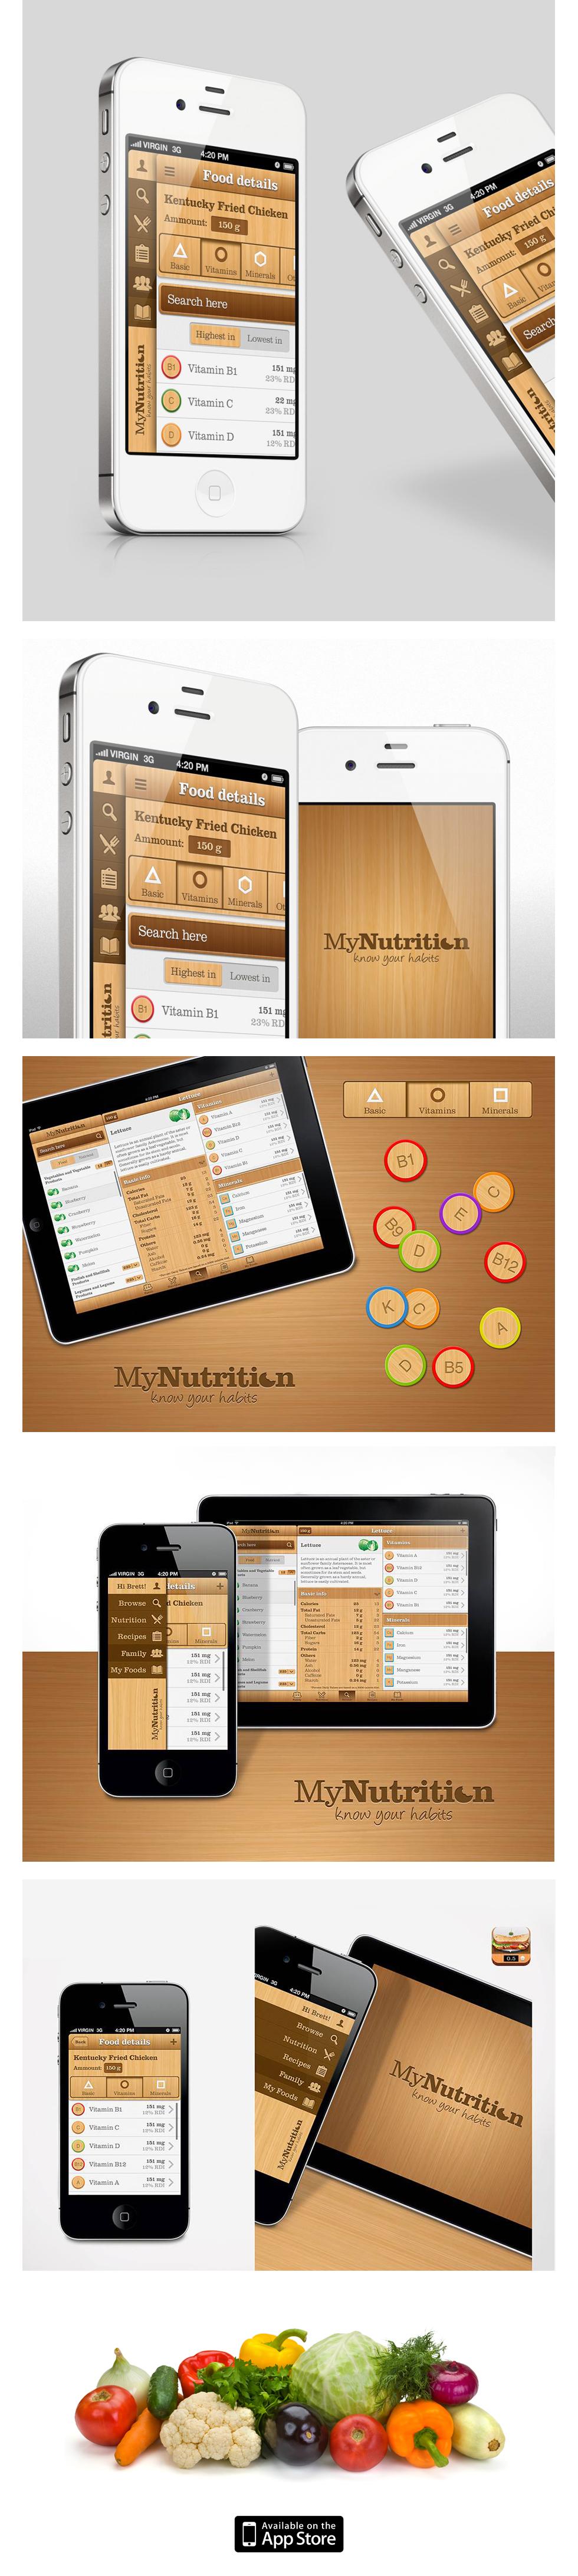 dizajn_mobilne_aplikacije_mynutrition_2